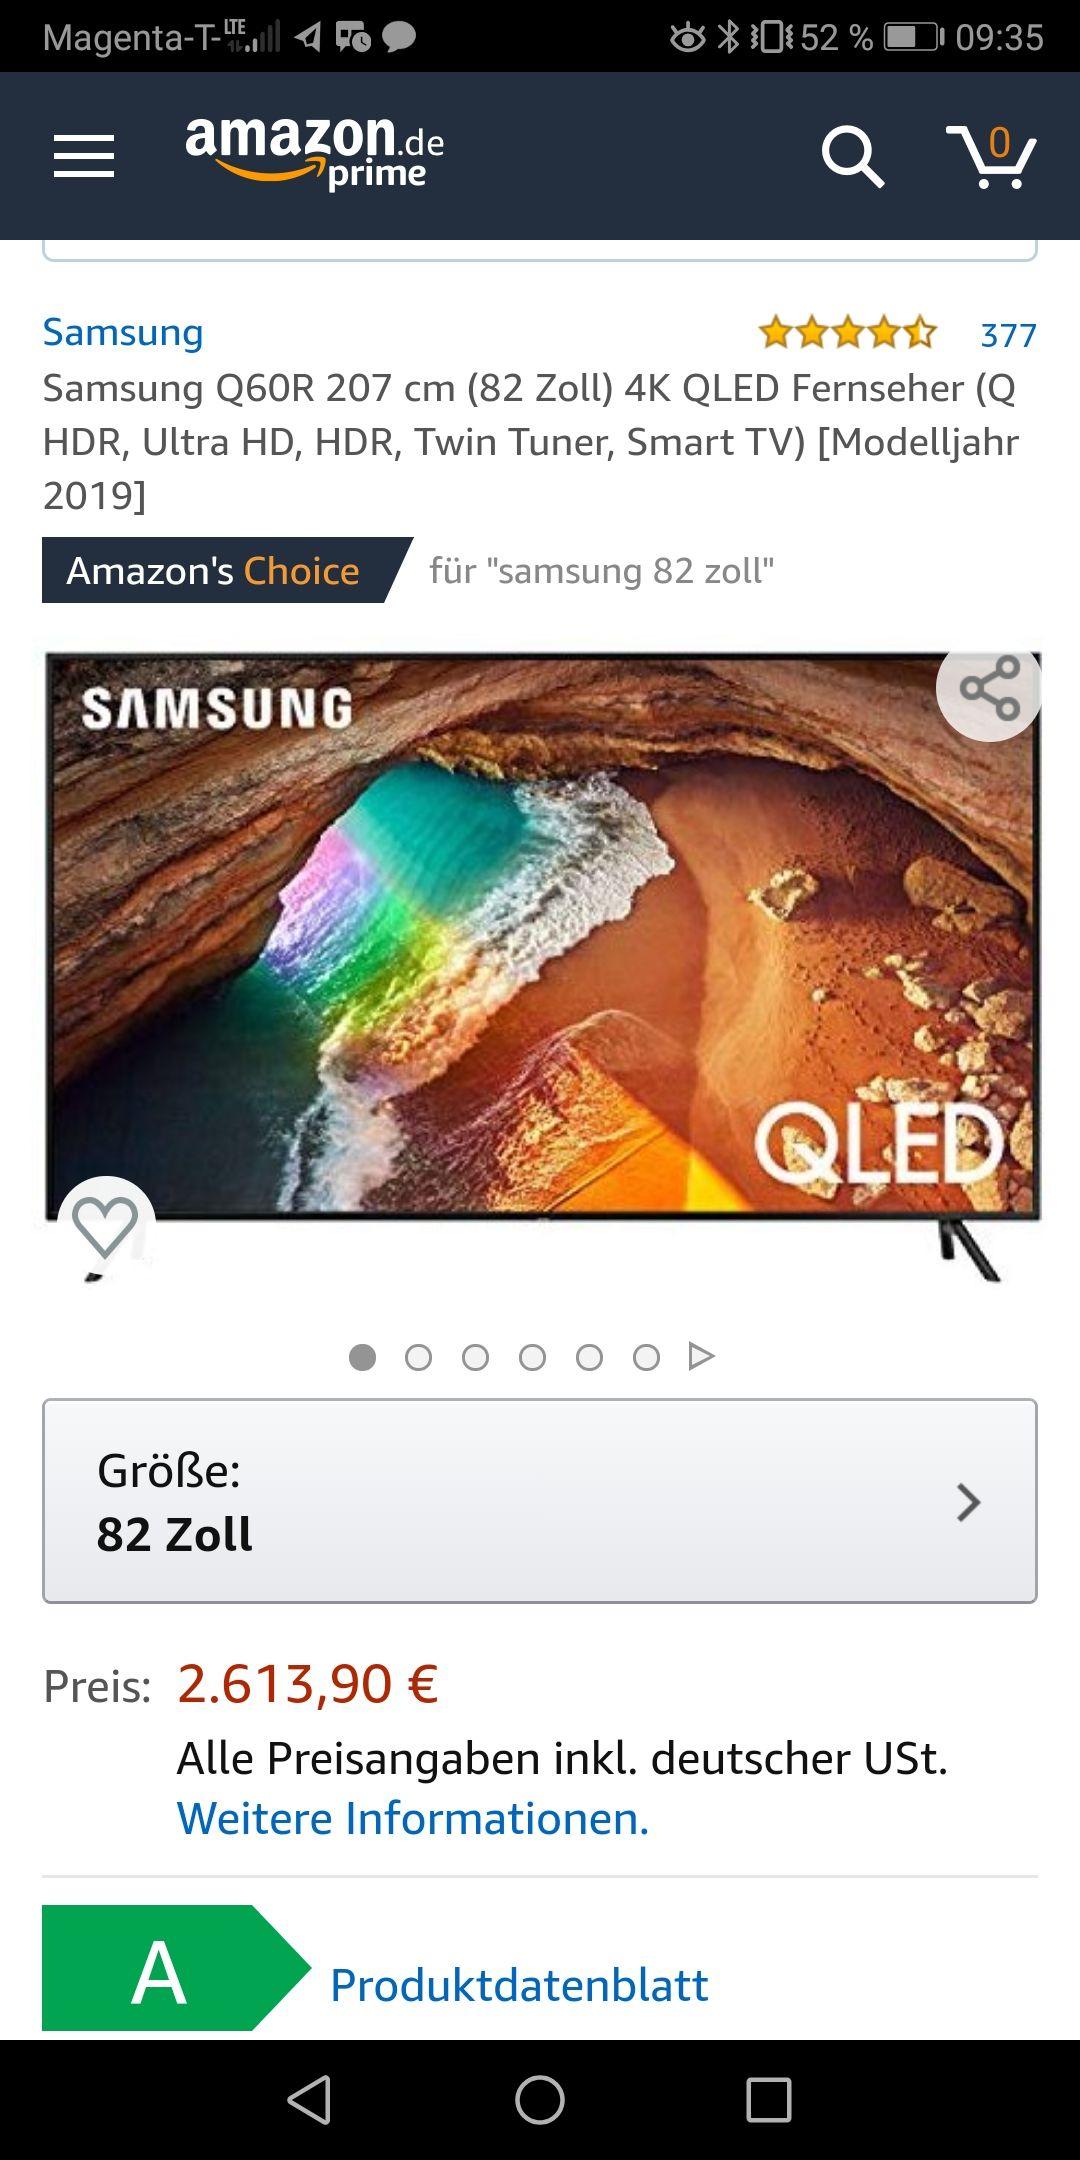 Samsung Q60R 207 cm (82 Zoll) 4K